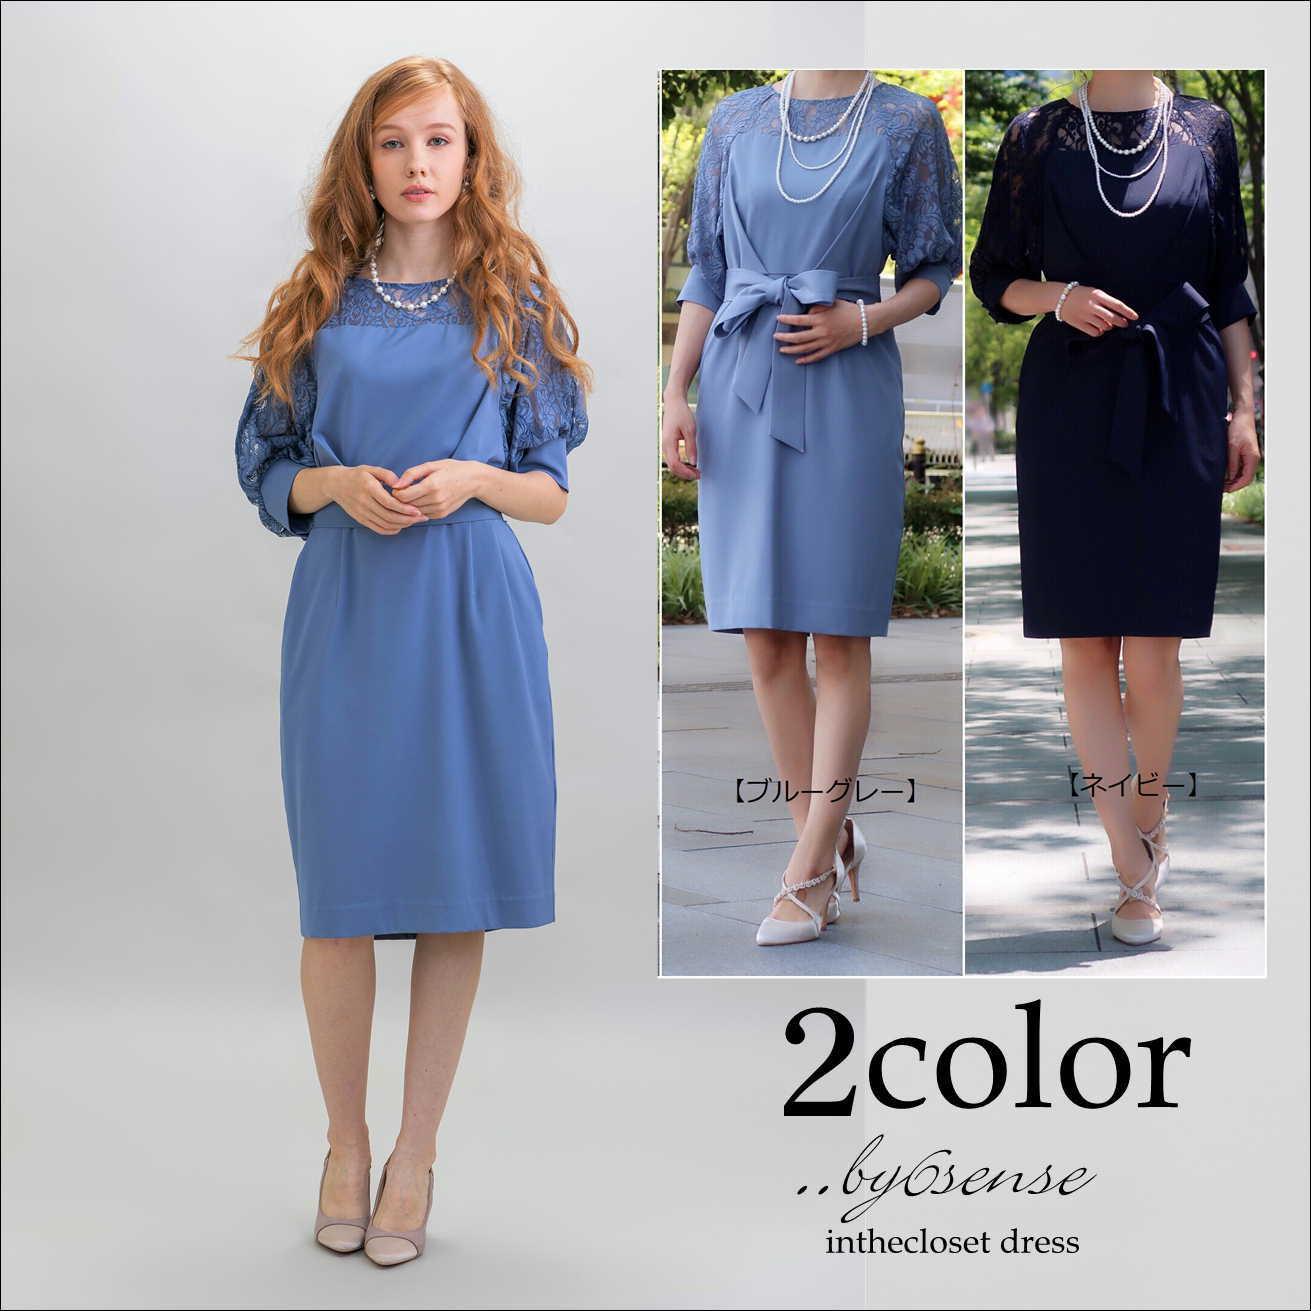 3color デコルテレース・ボリューム七分袖・タイトワンピース・ドレス【M/Lサイズ】